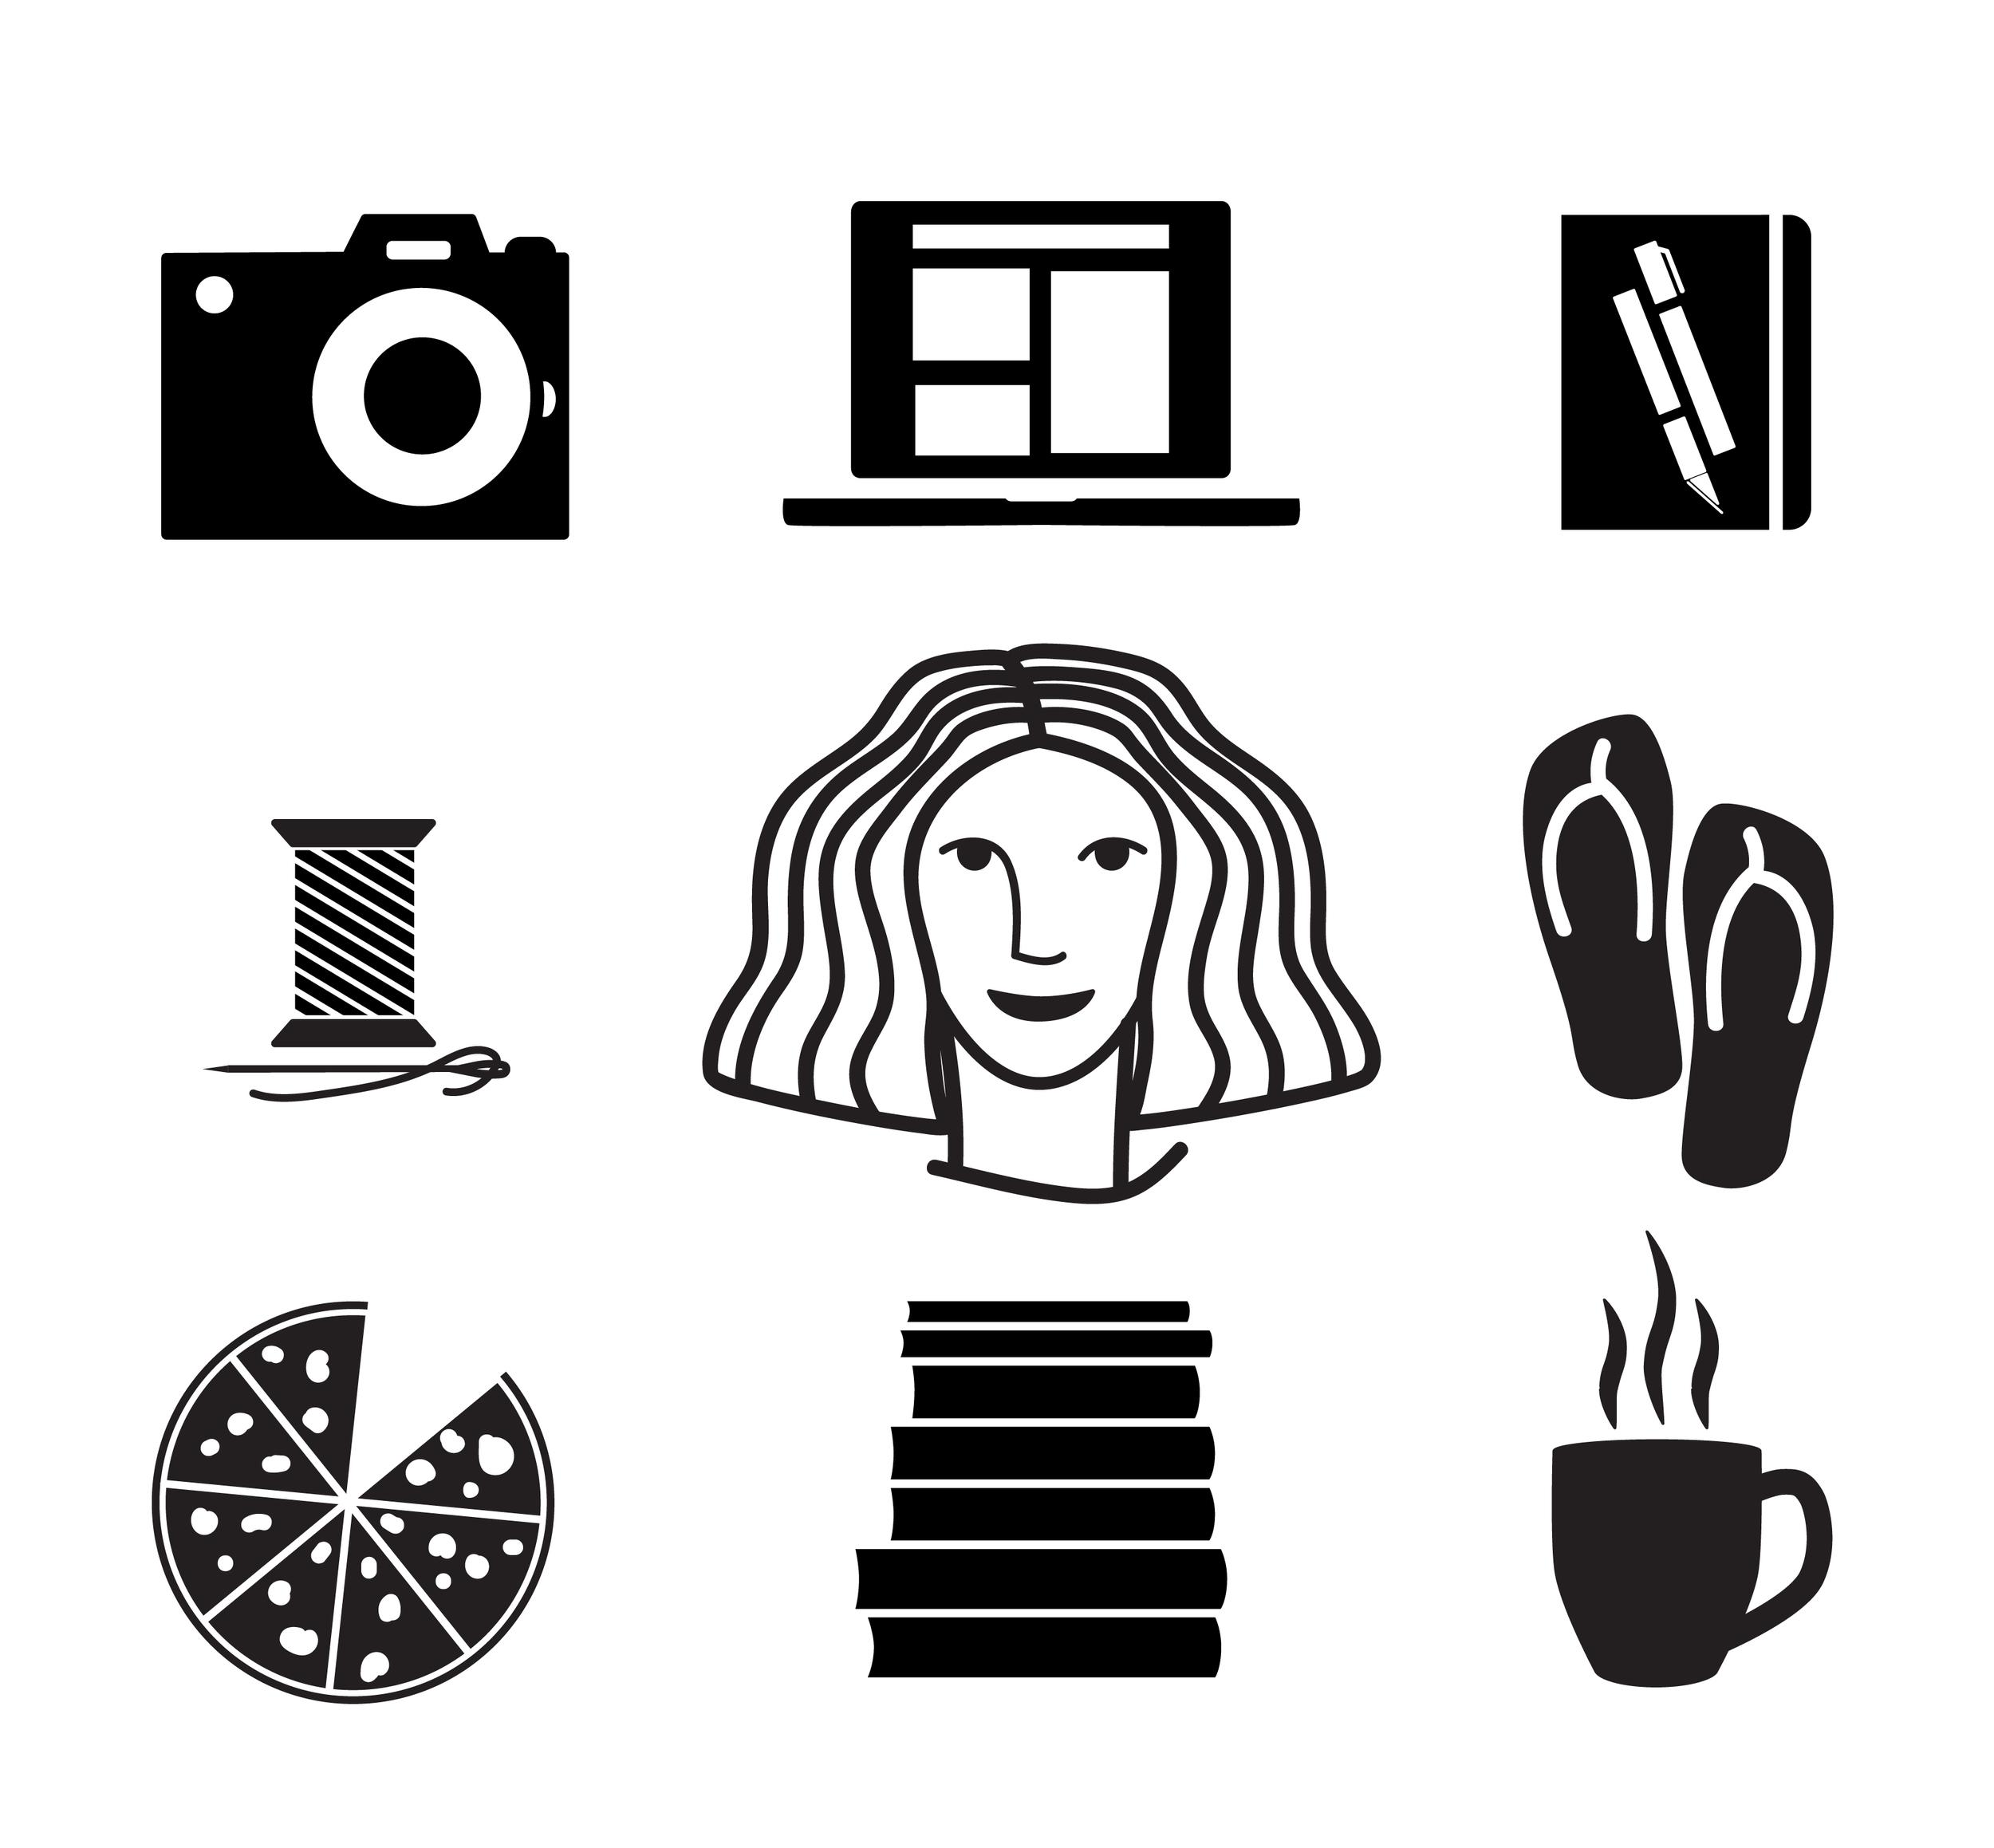 icons-13.jpg